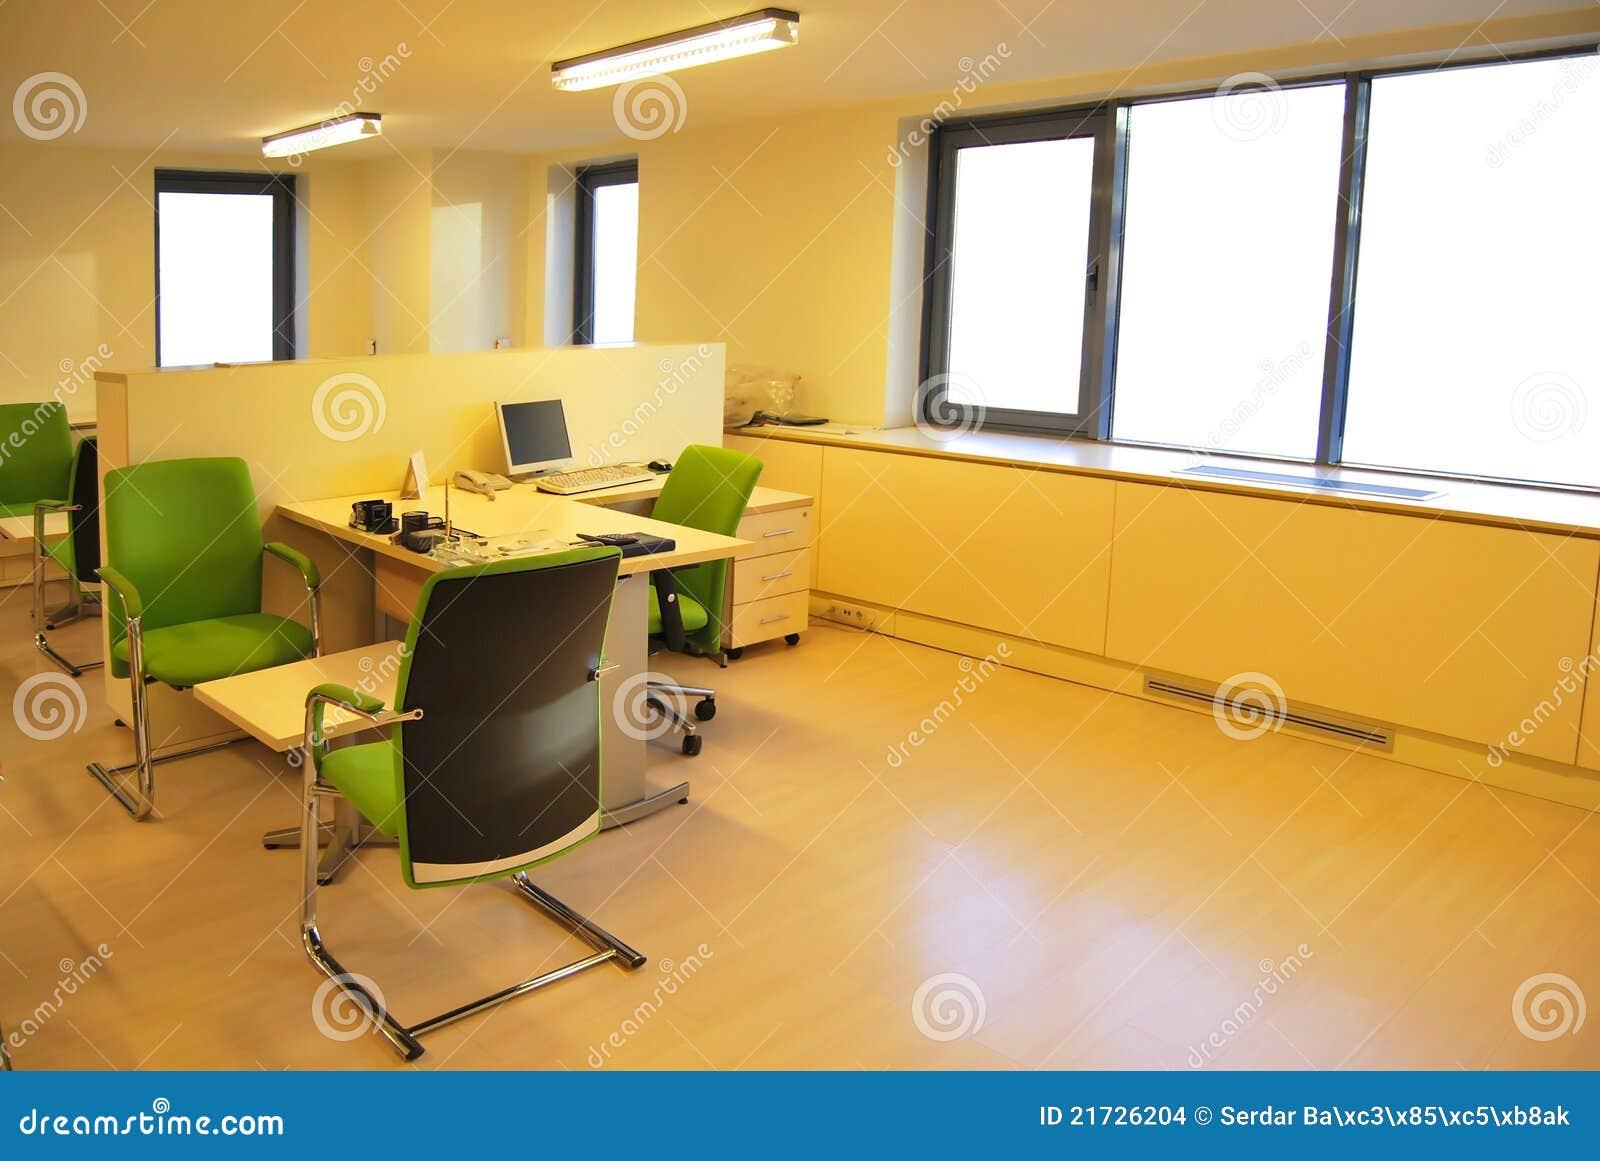 Leeres Buro Stockfoto Bild Von Bodenbelag Stuhl Direktor 21726204